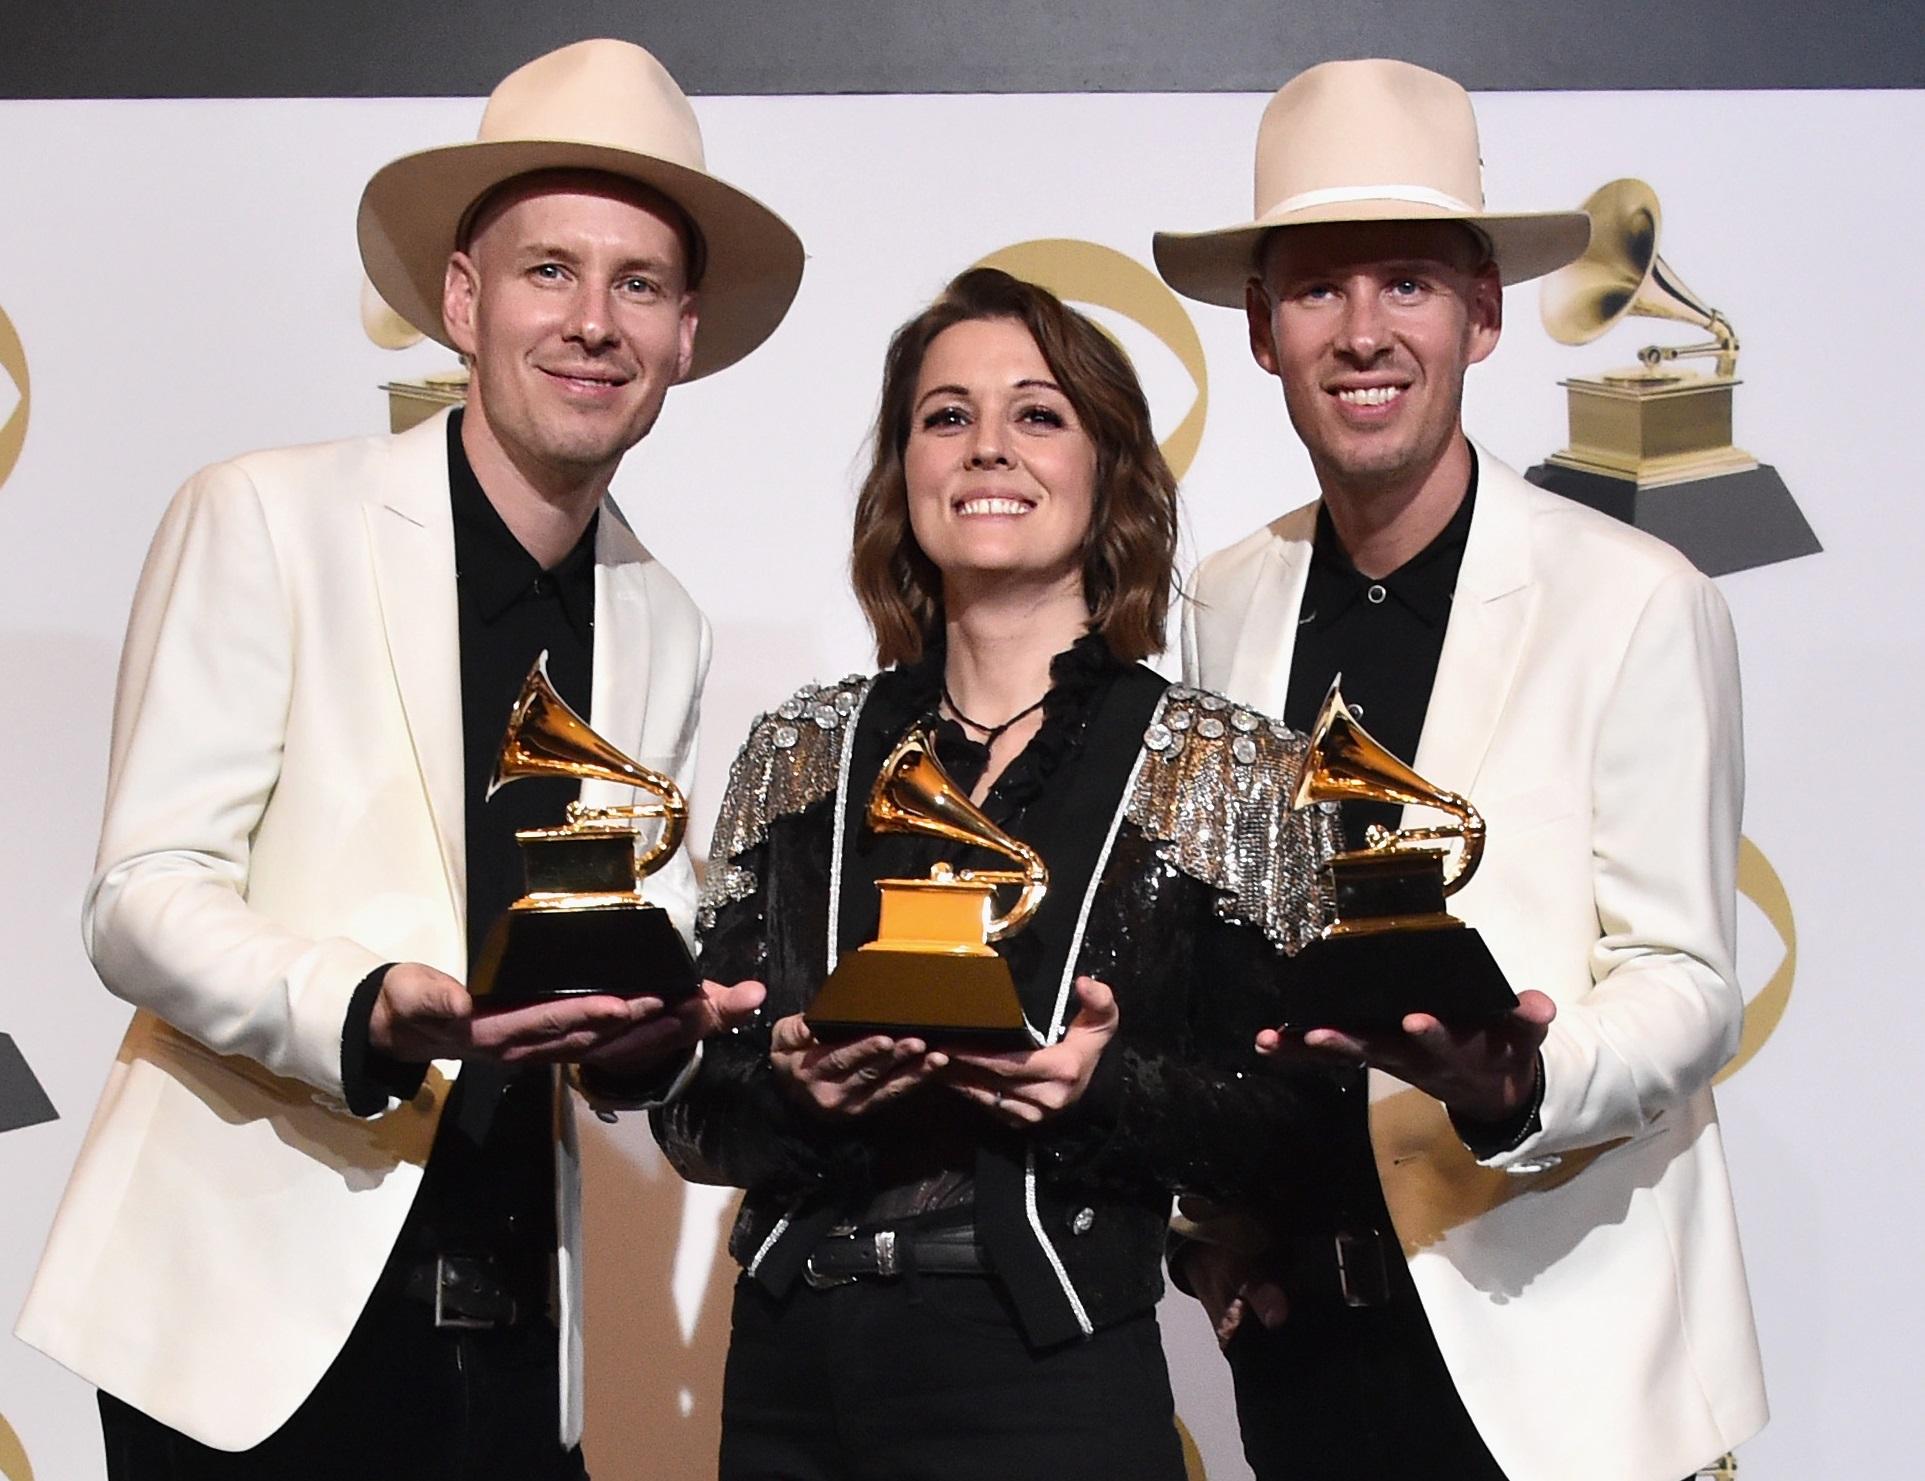 Brandi Carlile Takes Home Three Grammysat the 61st Annual Awards